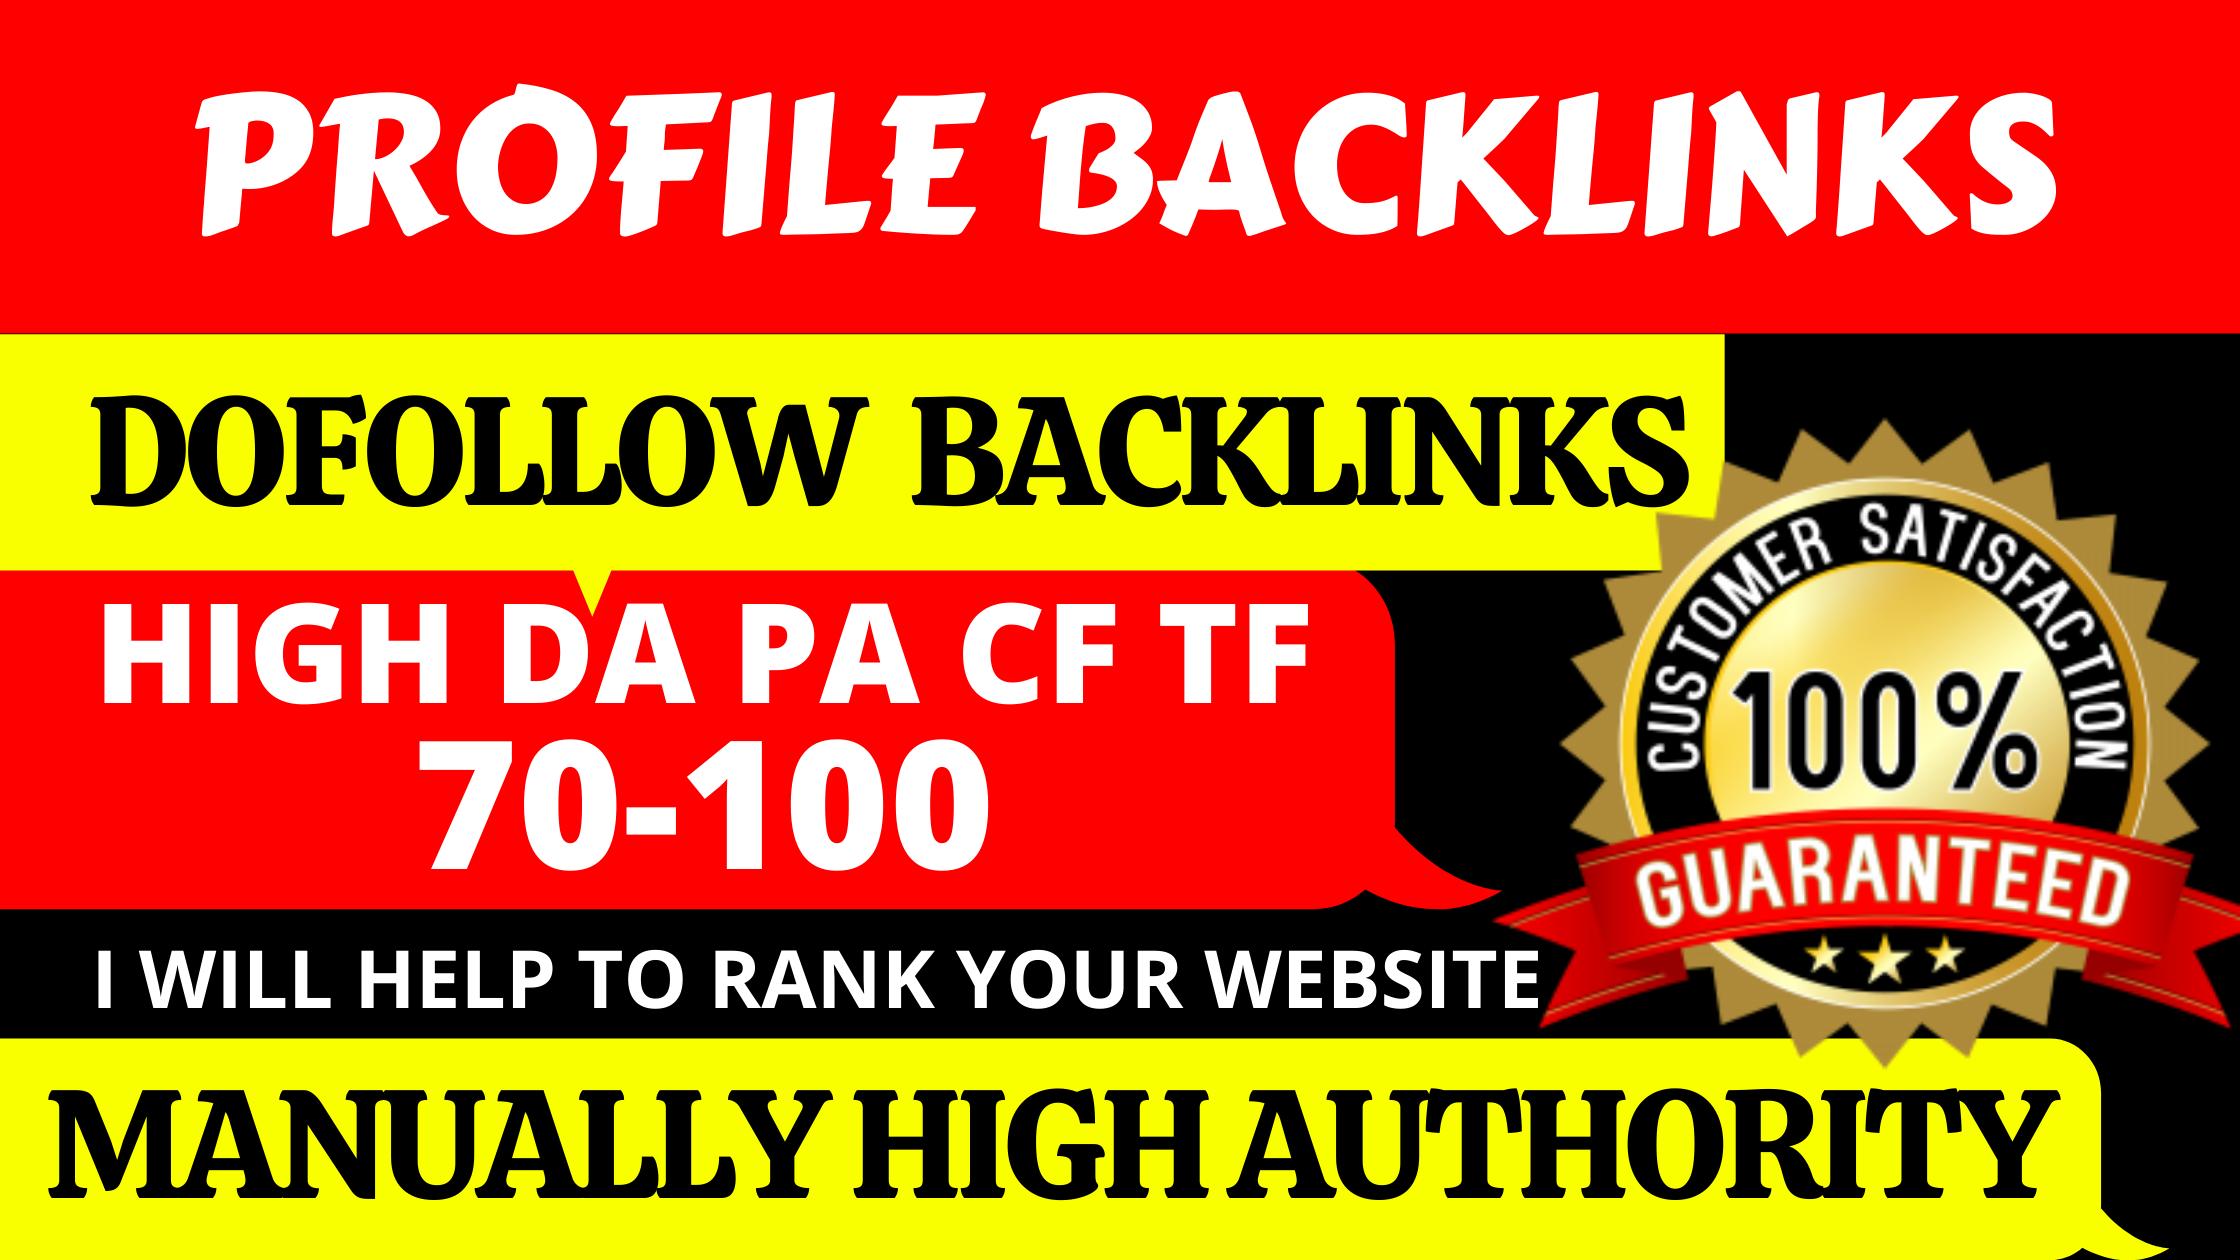 i will do 30+ manually high PR Dofollow profile backlinks